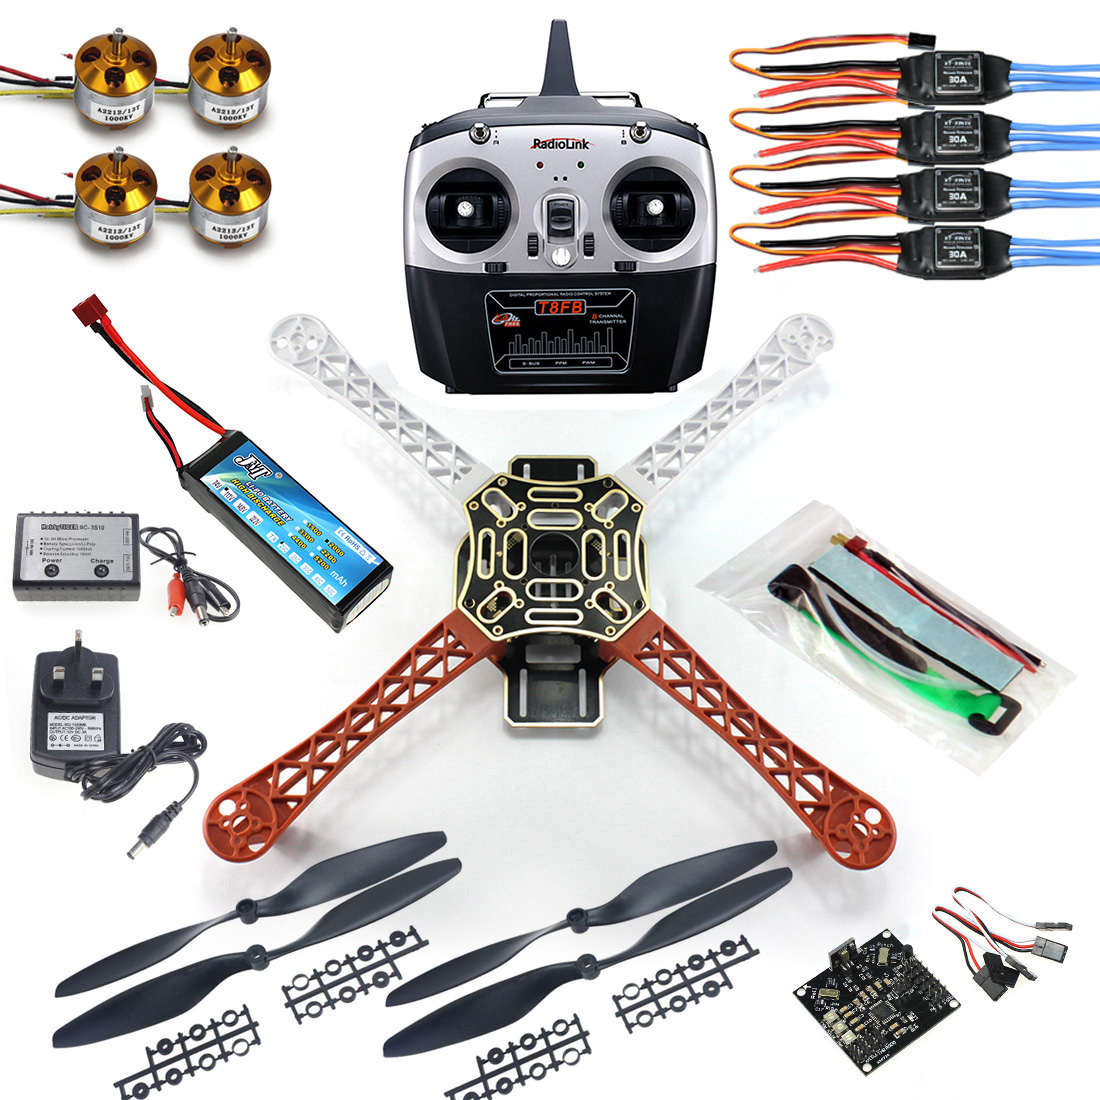 JMT 4 axle RC Multi QuadCopter Drone RTF ARF KK V2.3 Circuit board 1000KV Motor 30A ESC Lipo F450 Frame Kit 6ch TX RX F02192-A diy 4 axle rc multi quadcopter drone with kk v2 3 circuit board 1000kv motor 30a esc f450 frame kit radiolink t8fb 8ch tx